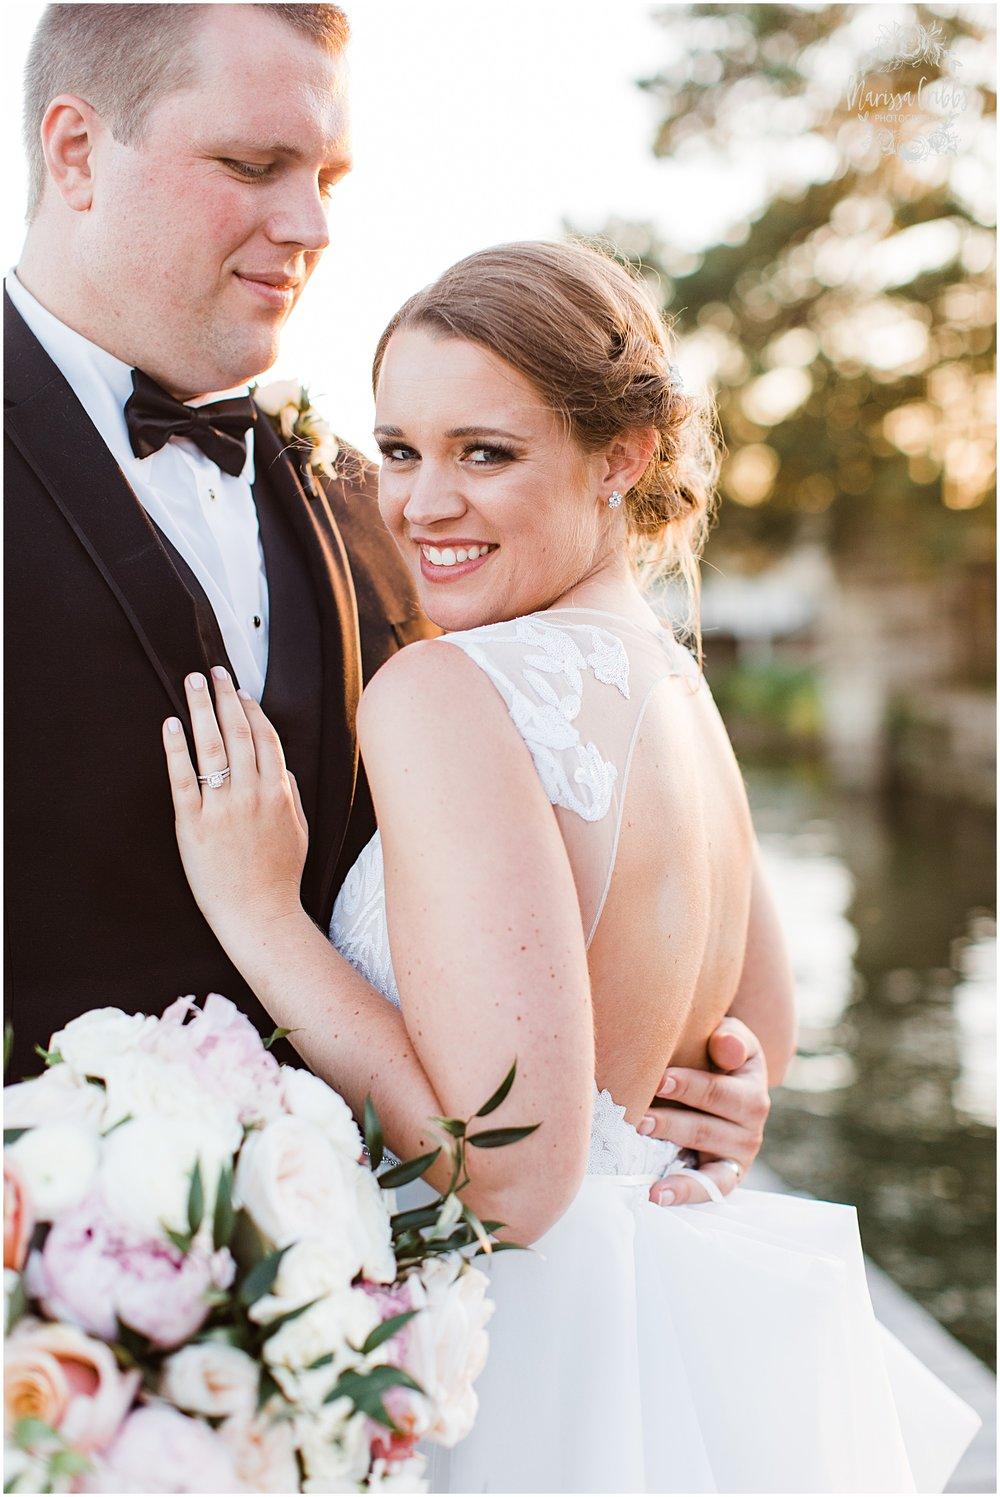 LAKE QUIVIRA COUNTRY CLUB WEDDING | MORGAN & RYAN | MARISSA CRIBBS PHOTOGRAPHY_5532.jpg